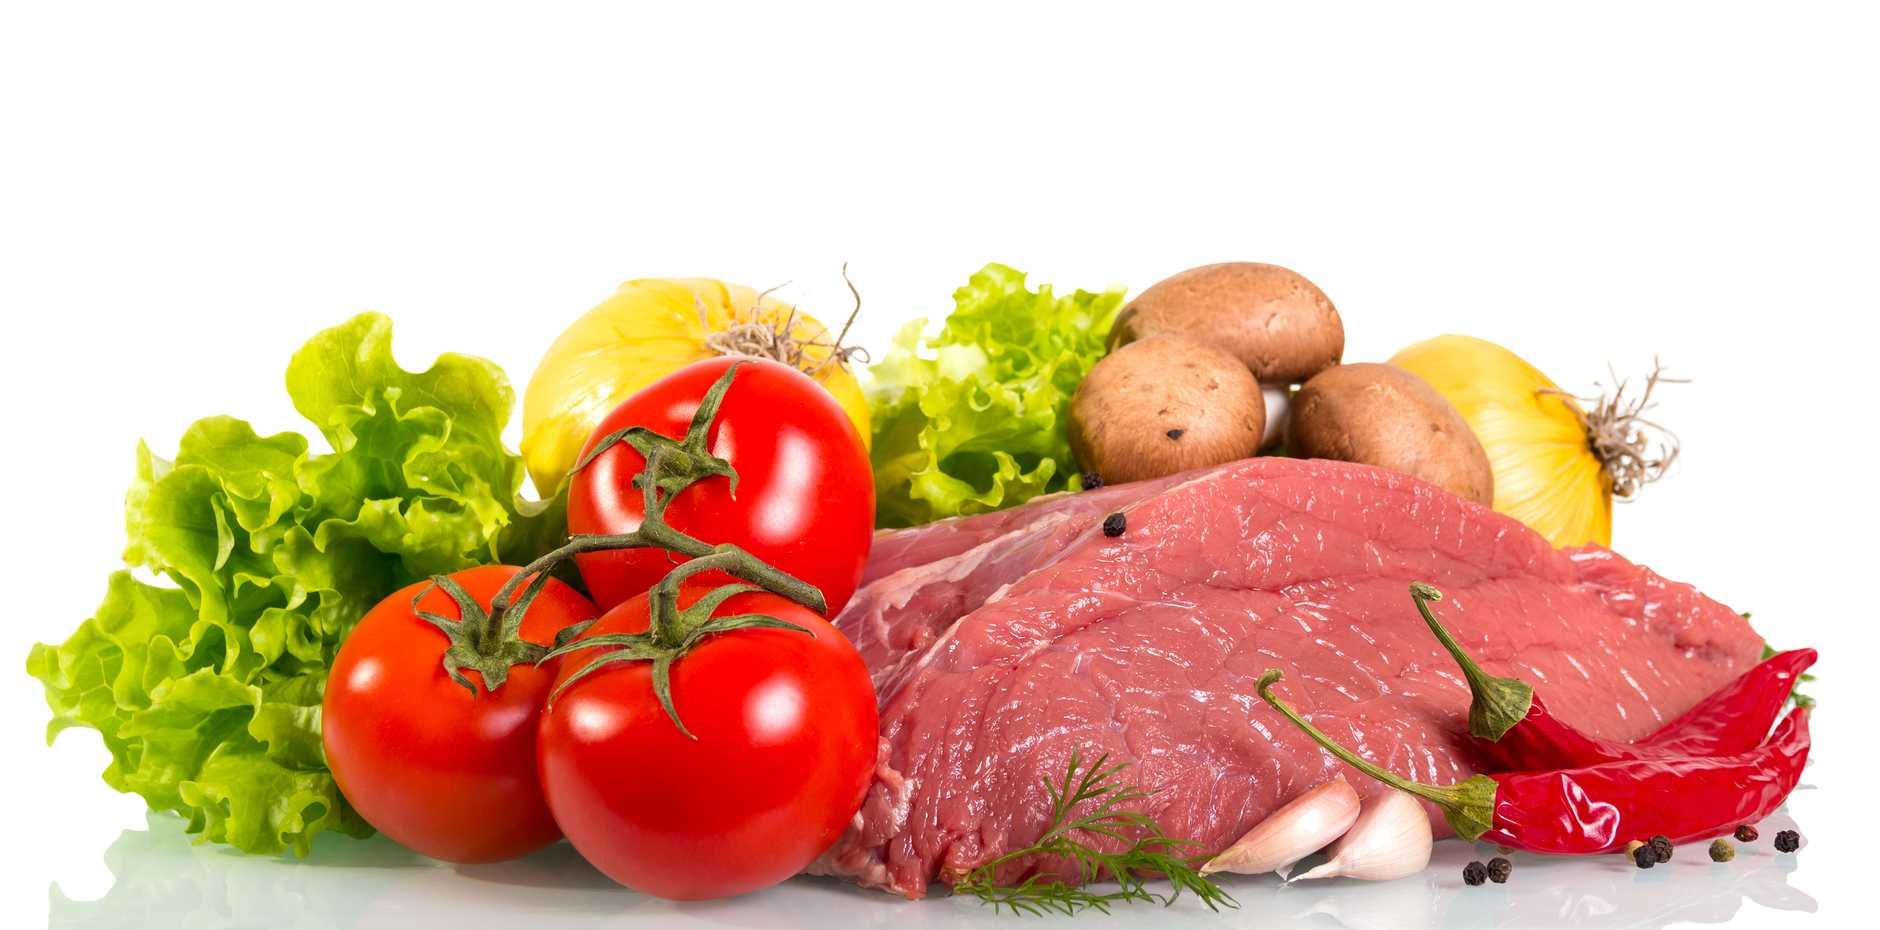 GOOD HABITS: Expert tips for improving kitchen and fridge food handling habits.